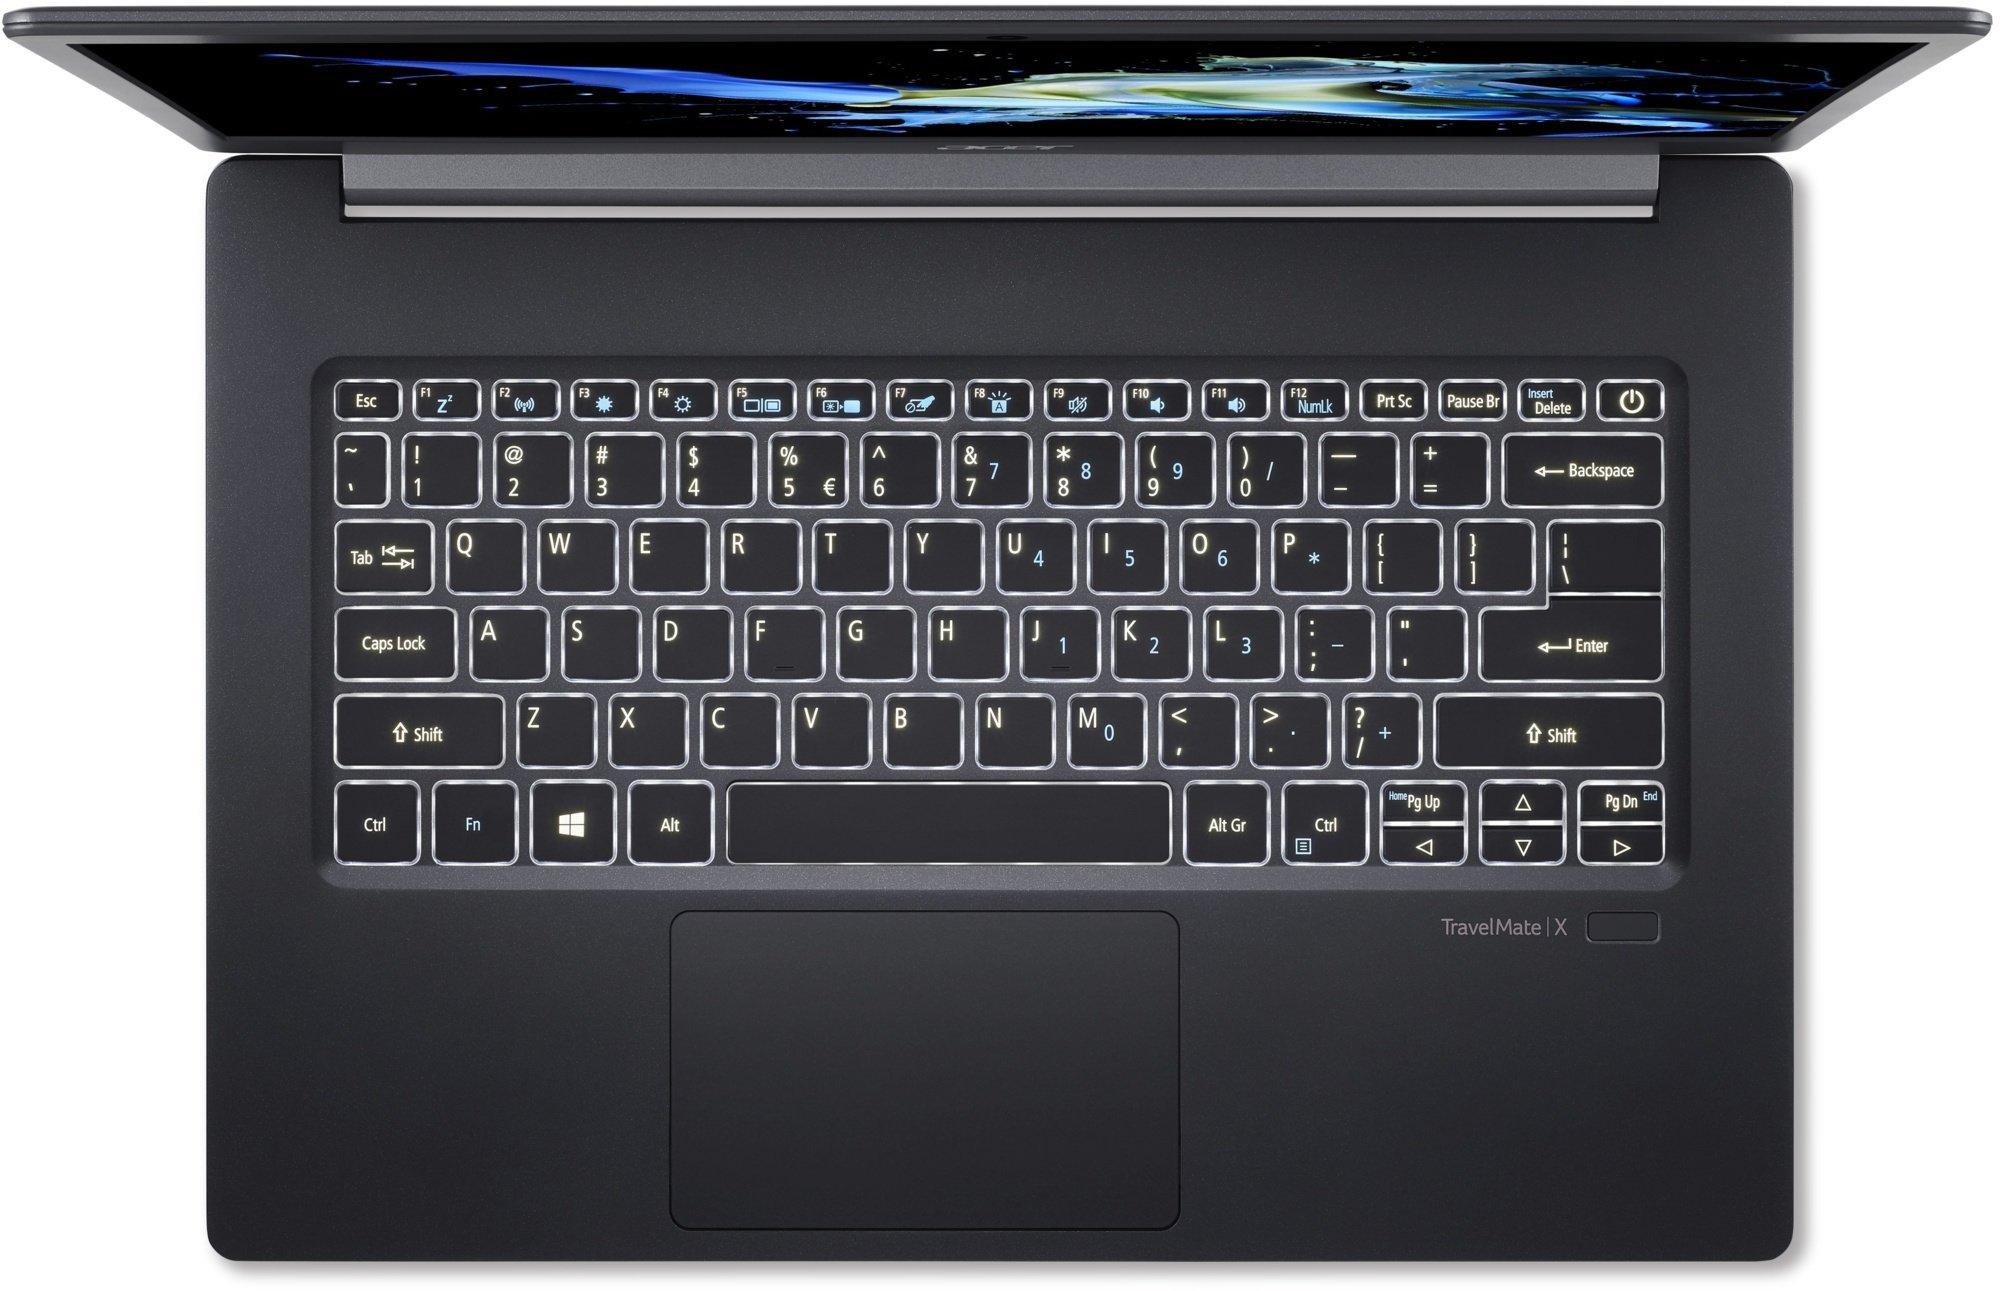 Acer TravelMate X5 X514-51-7411